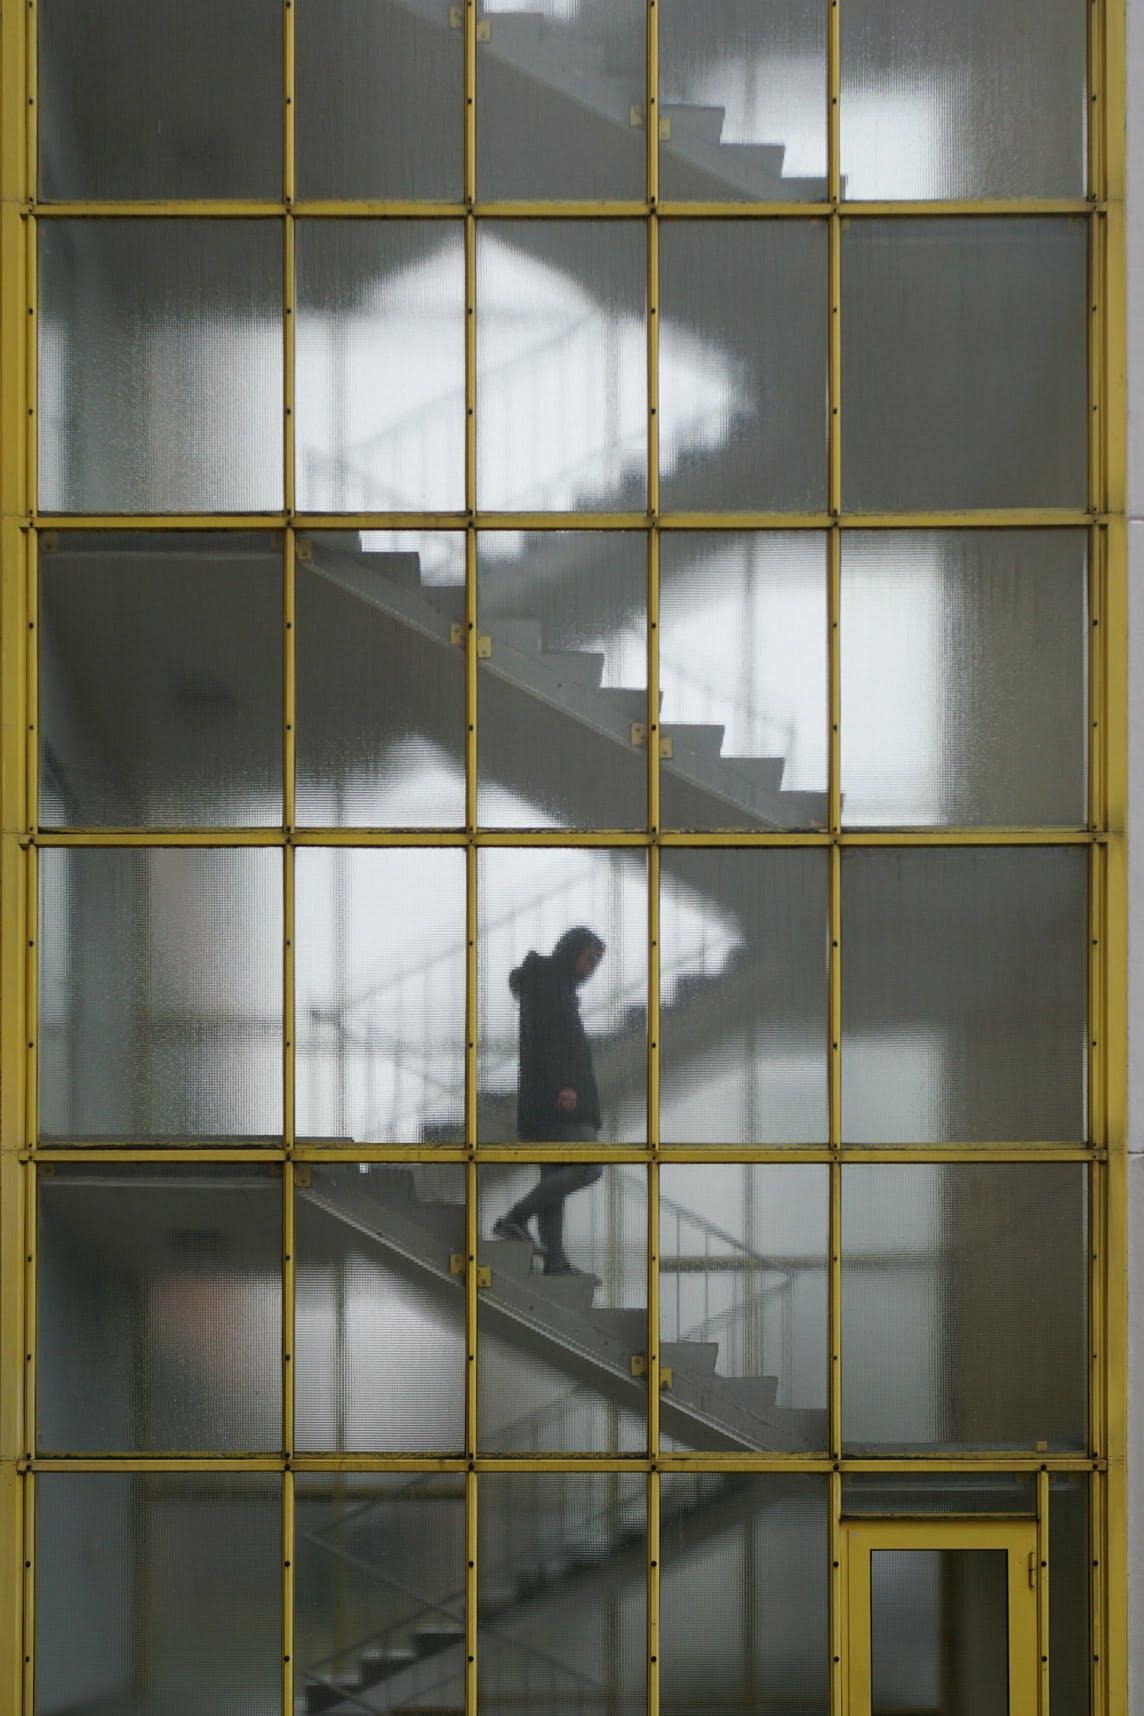 Altonaer Str. 7 Transparent Staircase